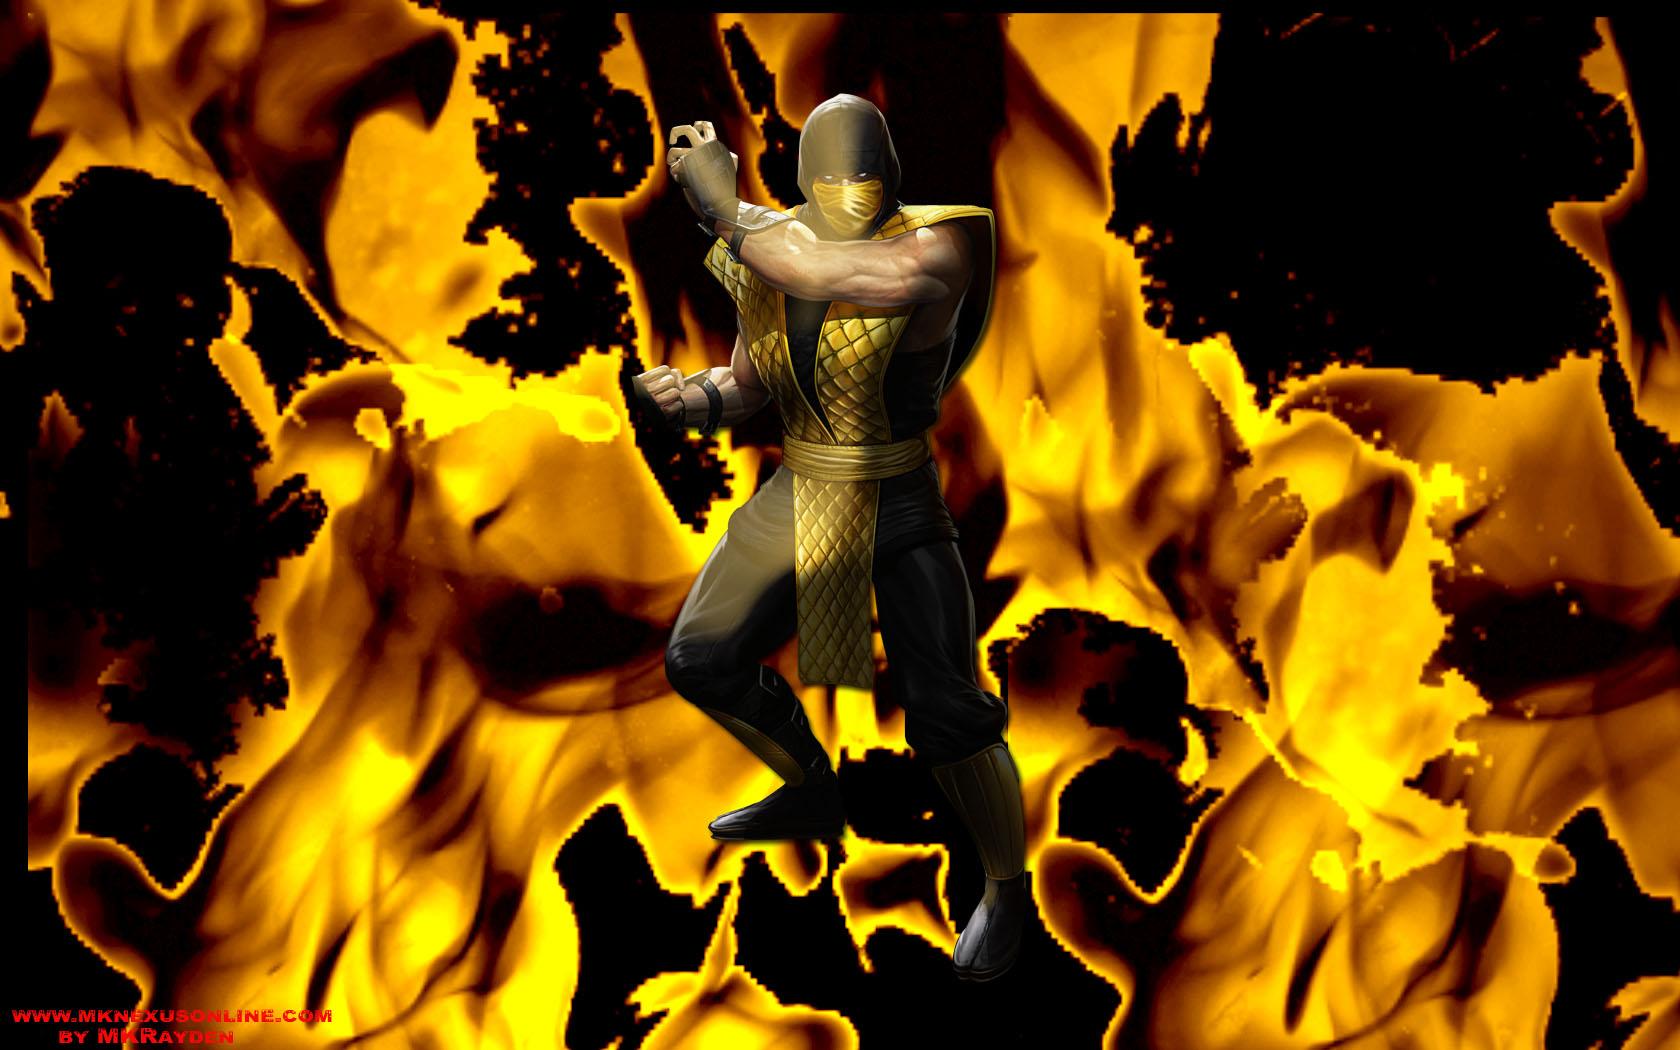 Mortal Kombat Wallpapers Mknexusonline Com